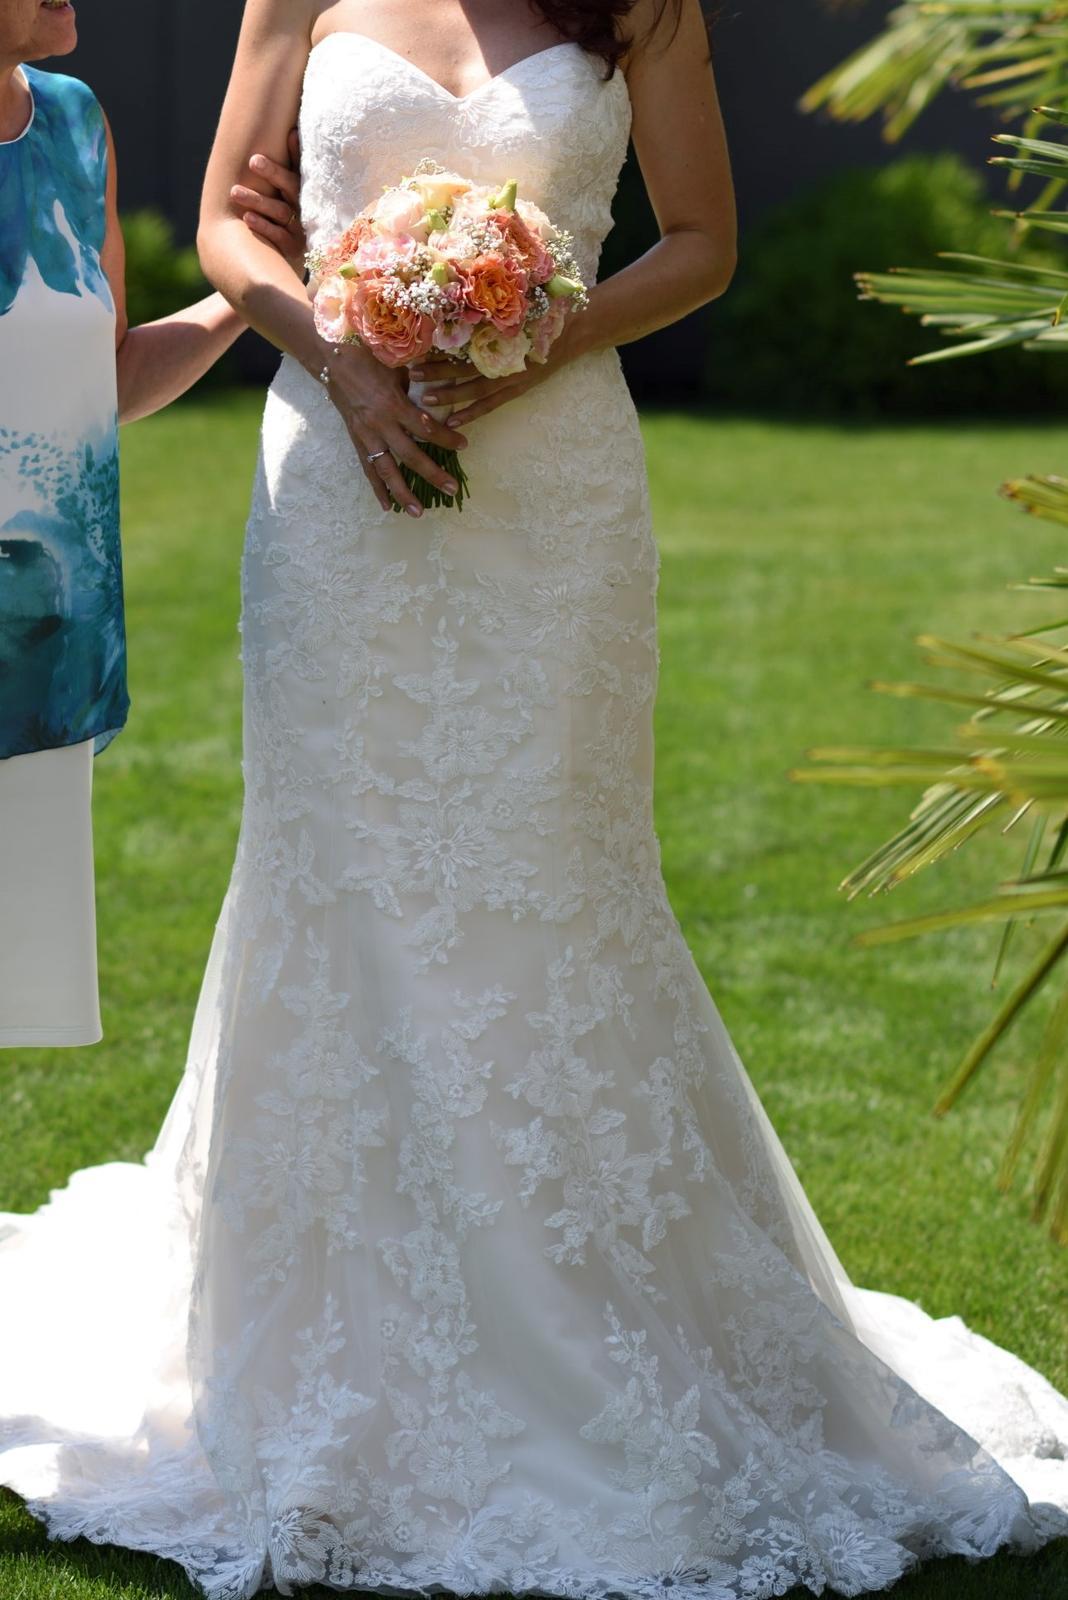 Svadobné šaty Maggie Sottero 34-38 - Obrázok č. 1